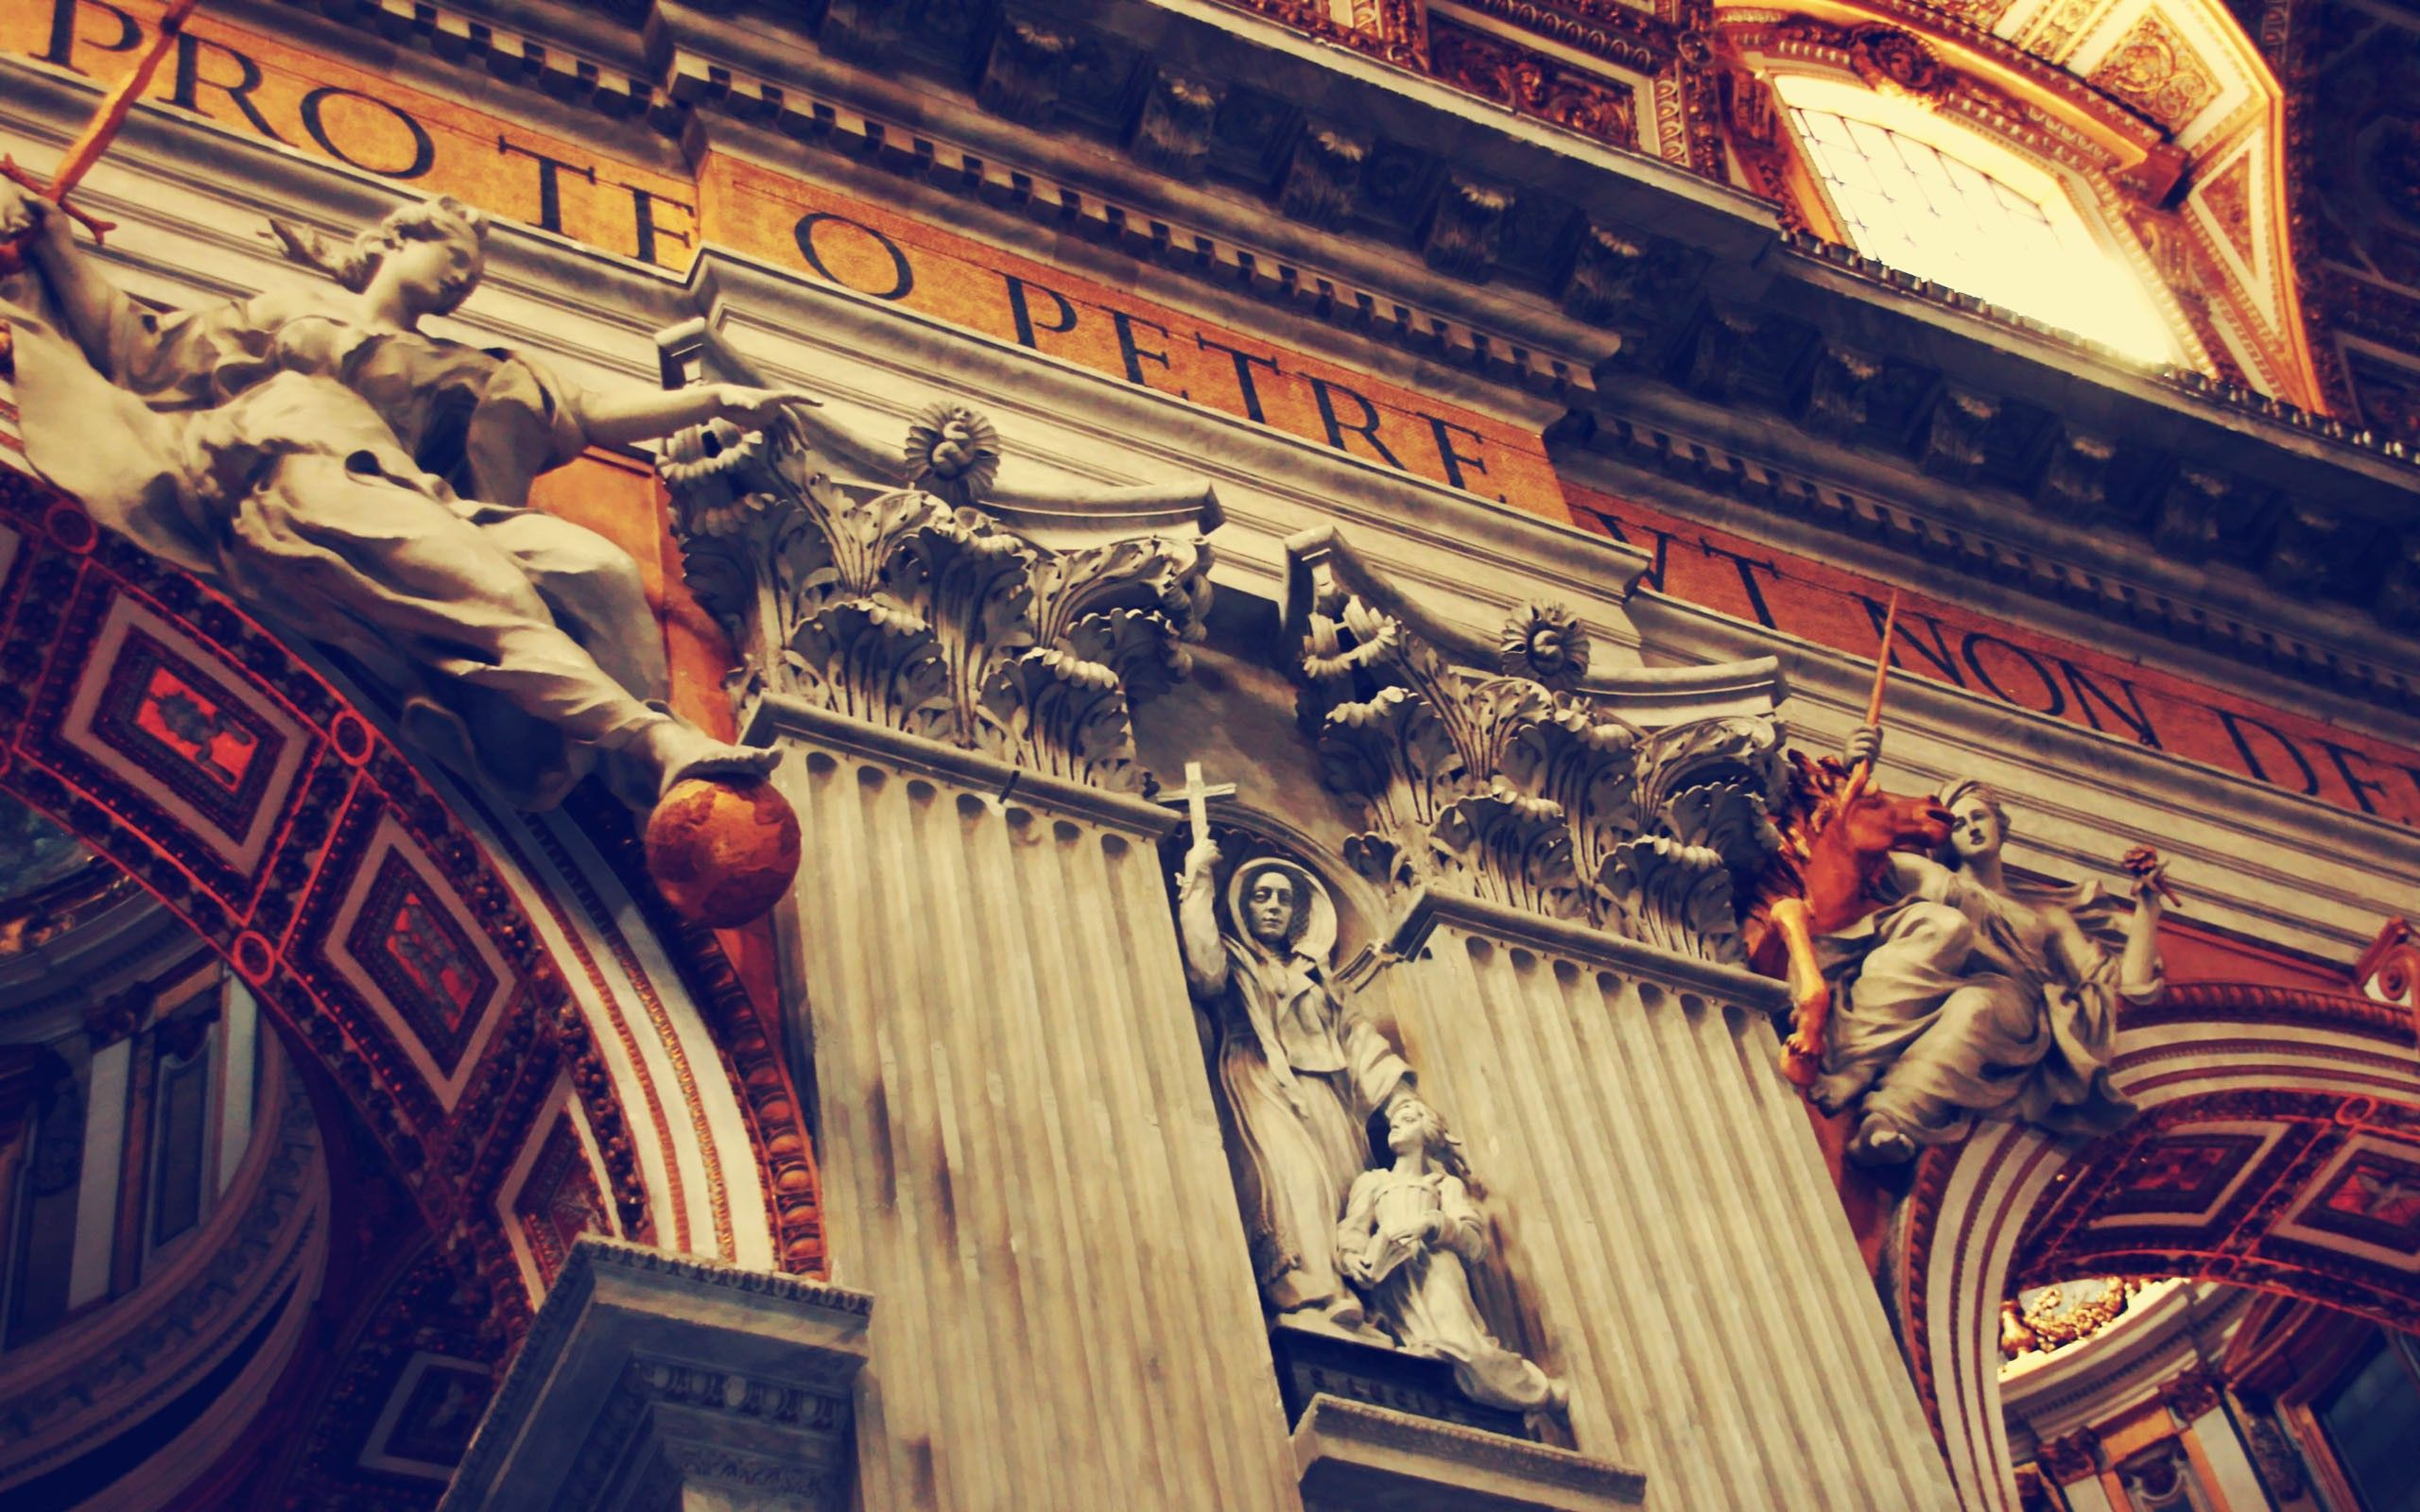 Inside-St.-Peters-Vatican-1600x2560.jpg (2560×1600)